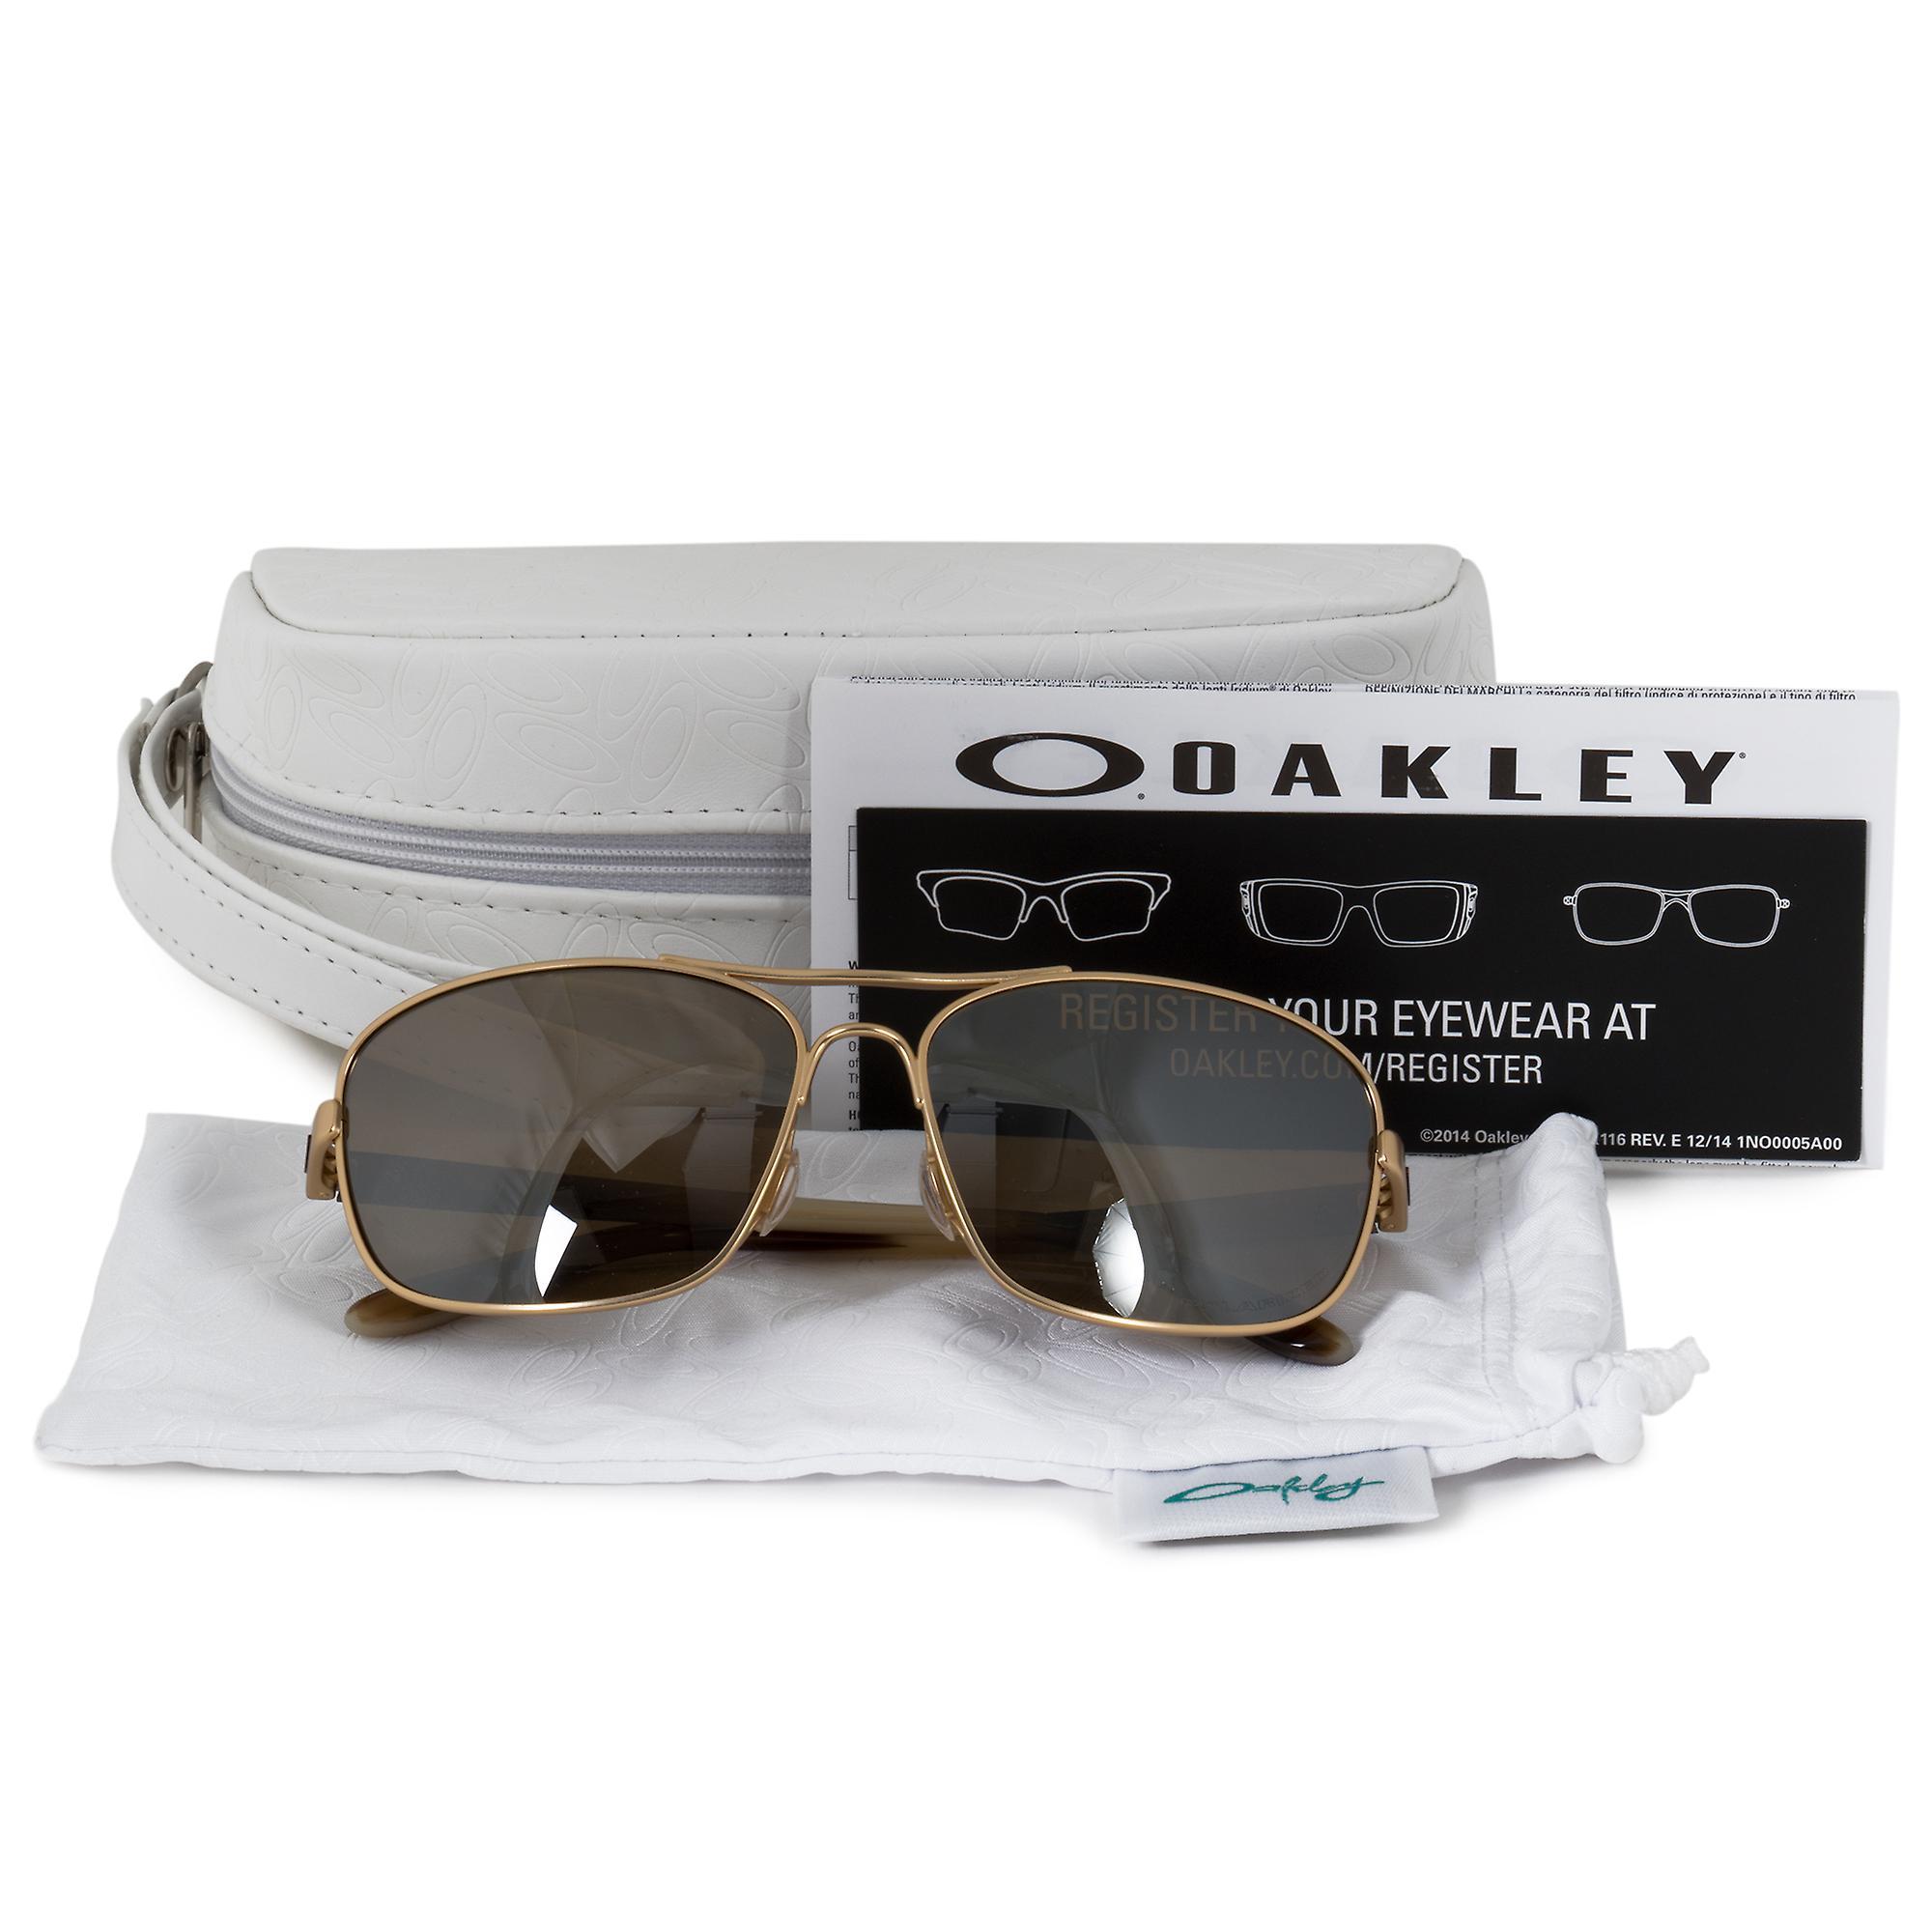 Oakley Sanctuary Square Sunglasses 0OO4116 411605 58 | Gold Frame | Polarized Brown Lenses